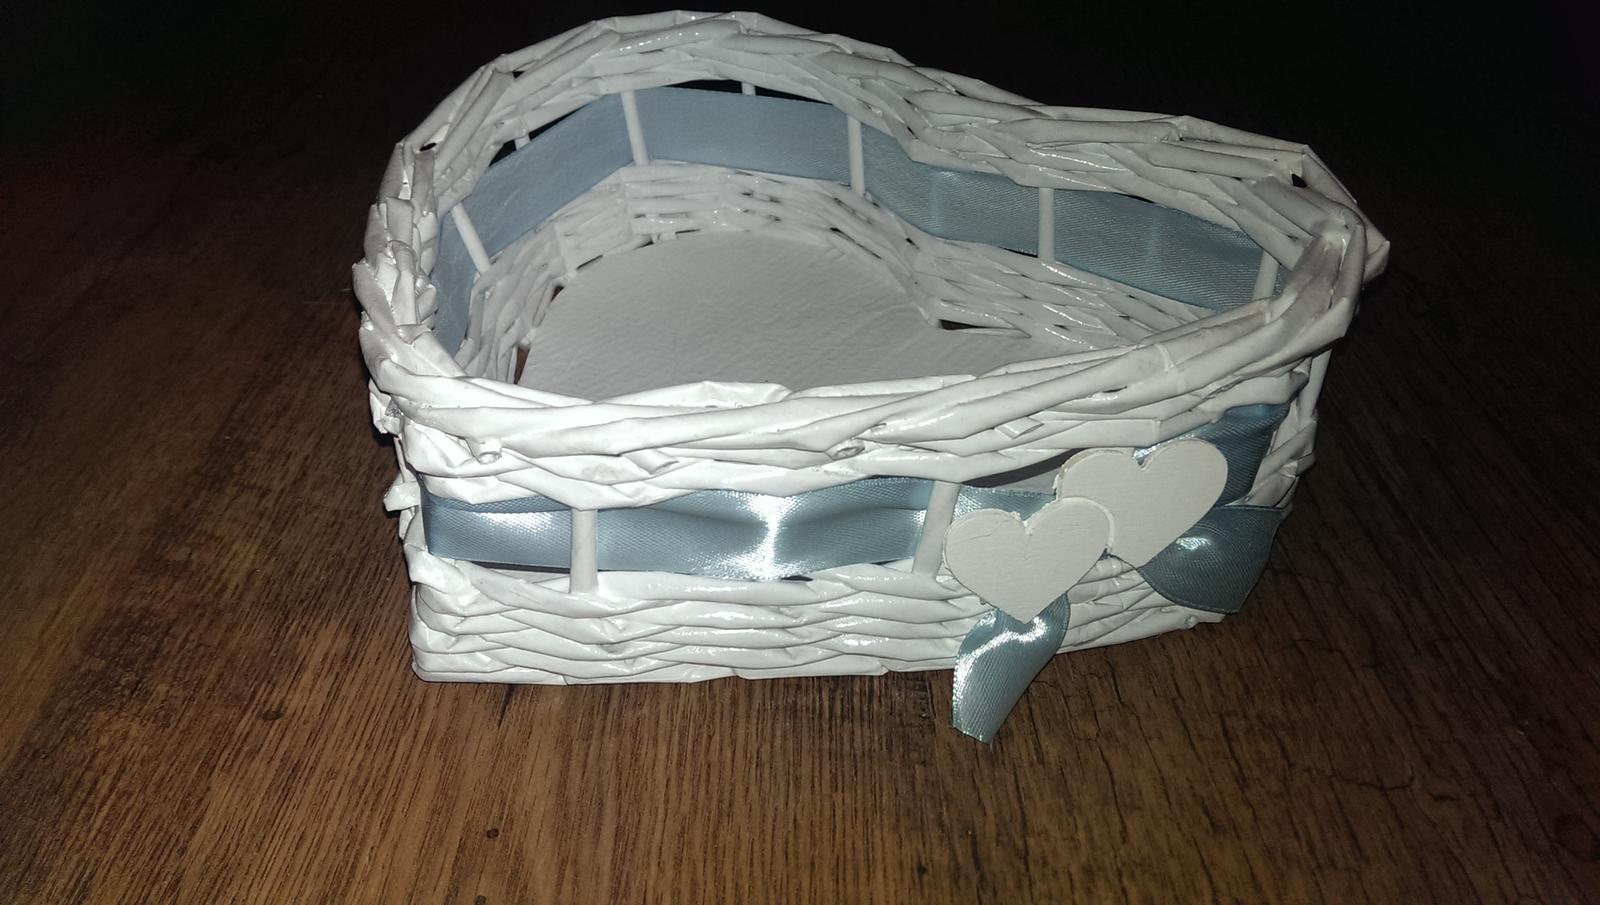 biely košík s modrou stužkou - Obrázok č. 1